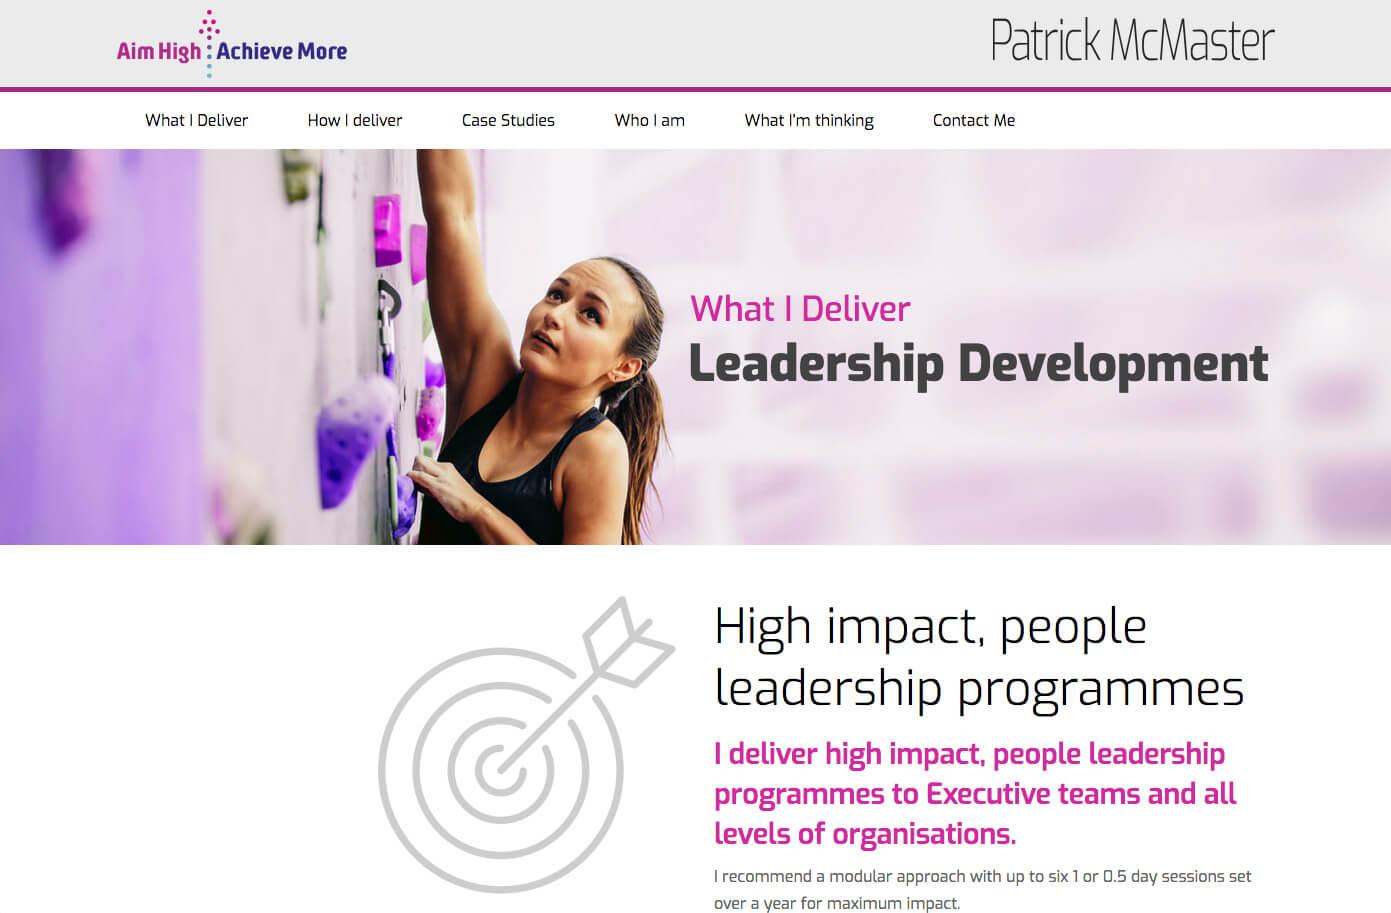 Patrick McMaster Leadership Development